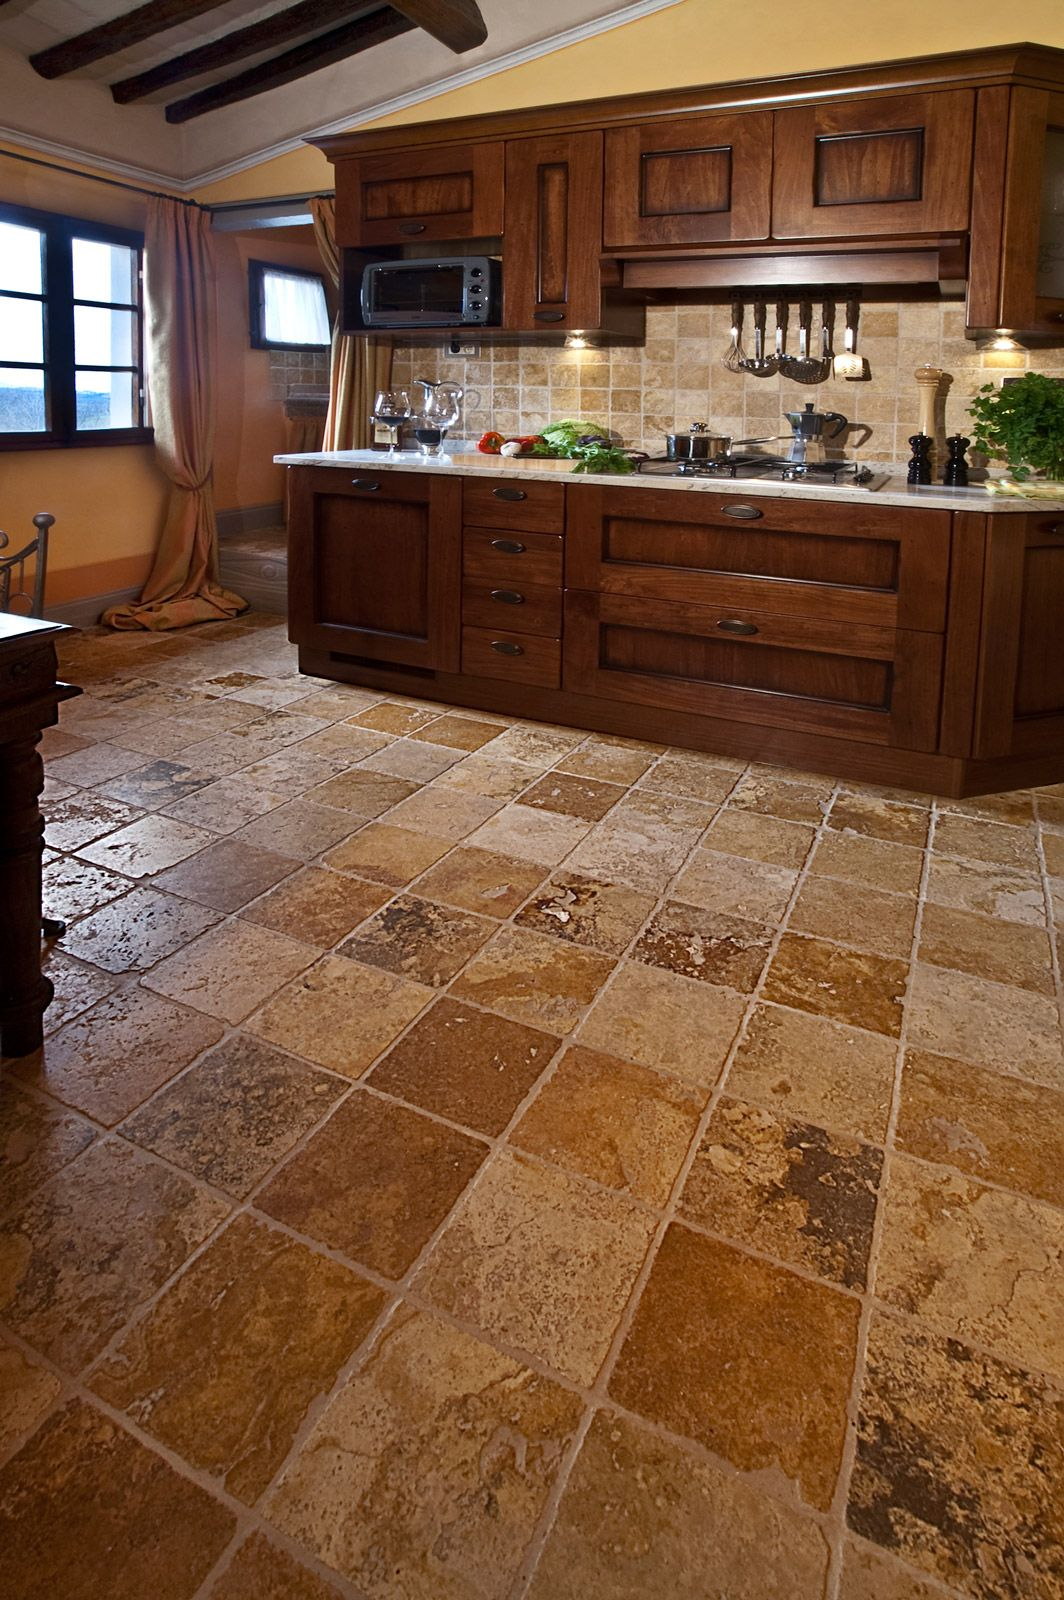 pavimento in pietra per cucina - Cerca con Google | casa | Pinterest ...